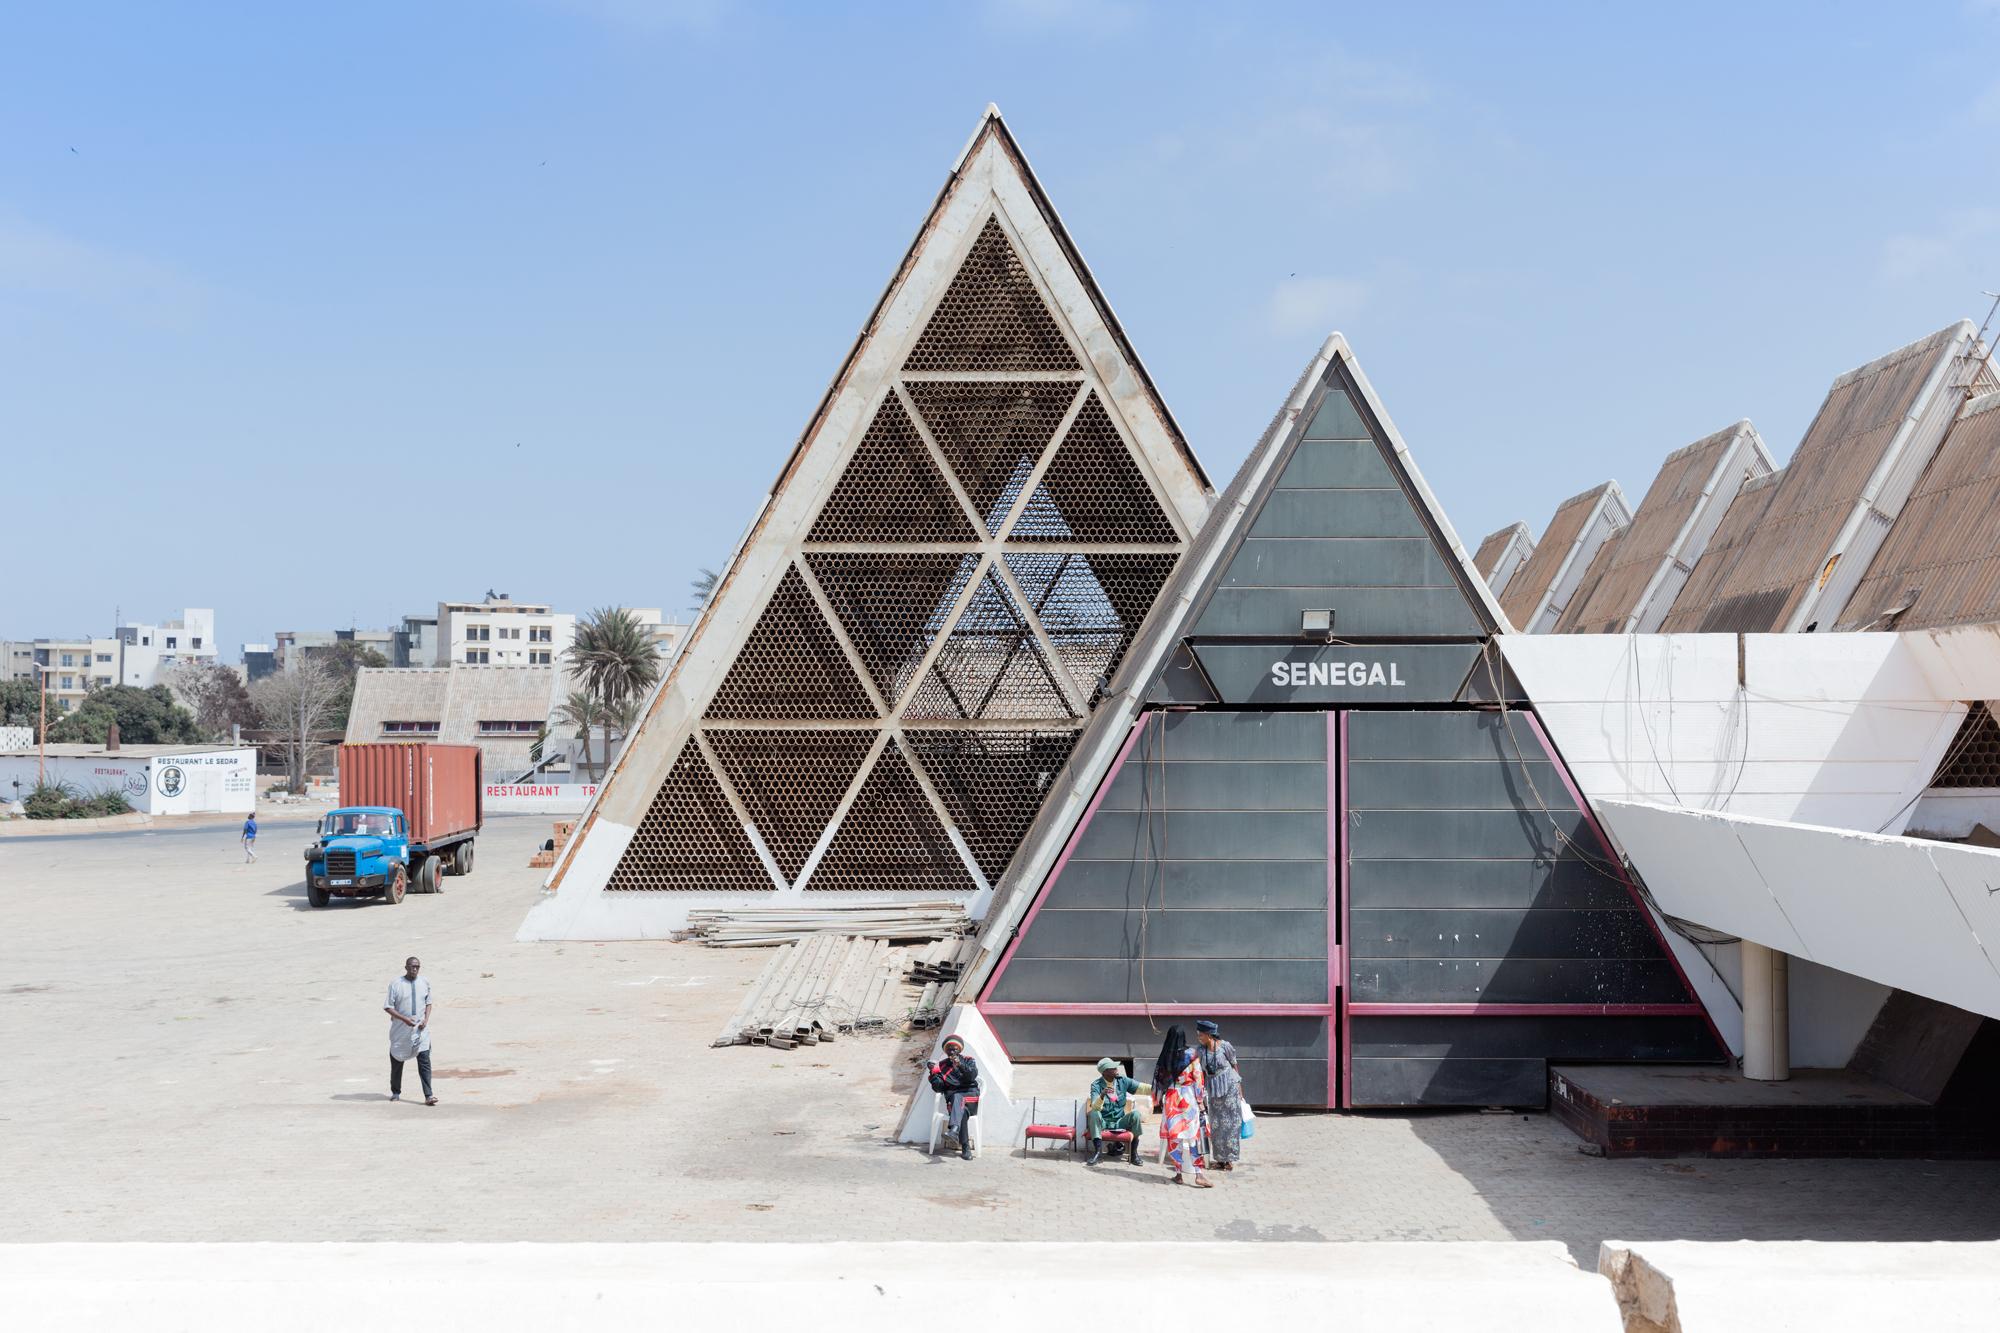 Graham-Foundation-Architecture-of-Independence-1-Dakar